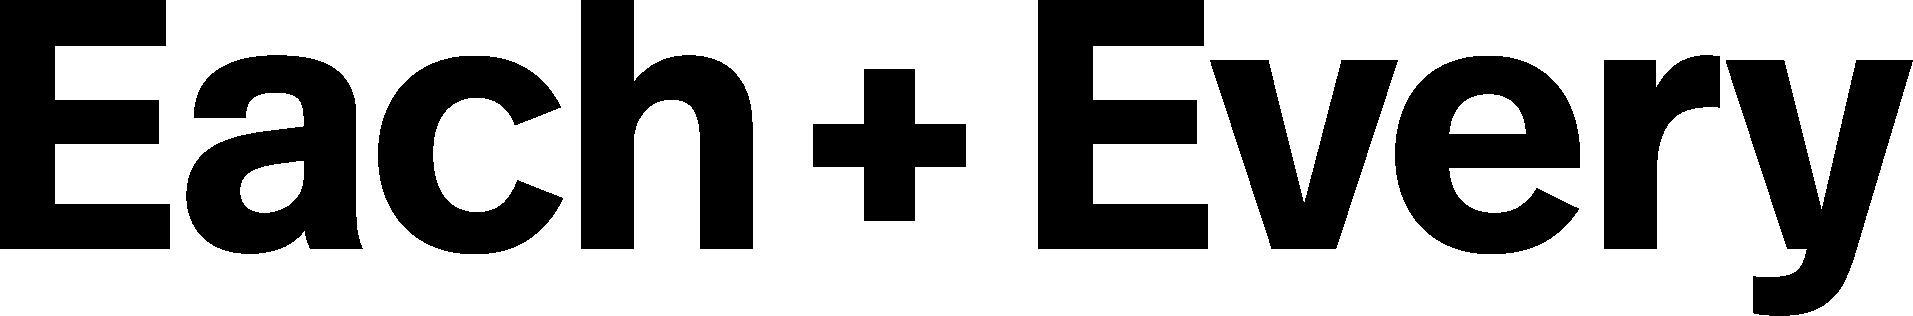 EELogo-Black-Full